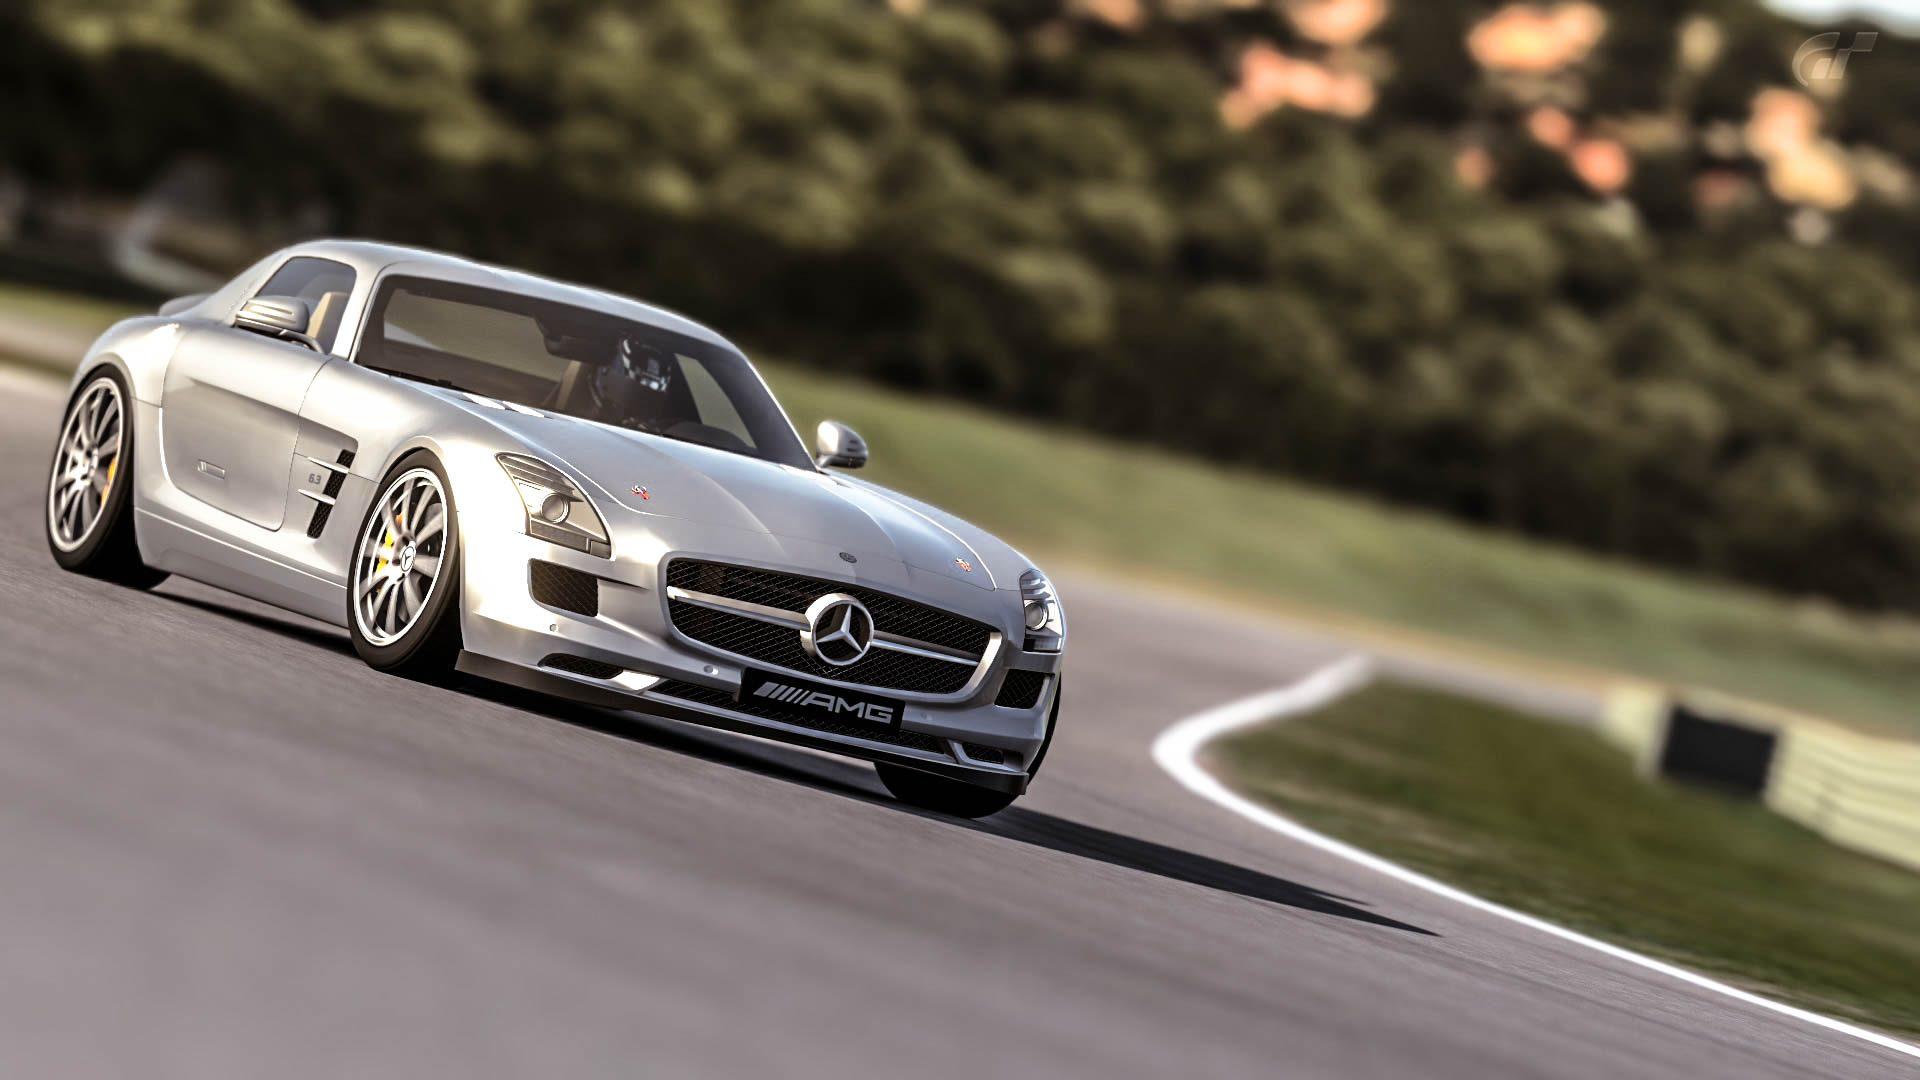 Mercedes_SLS_AMG_05.jpg